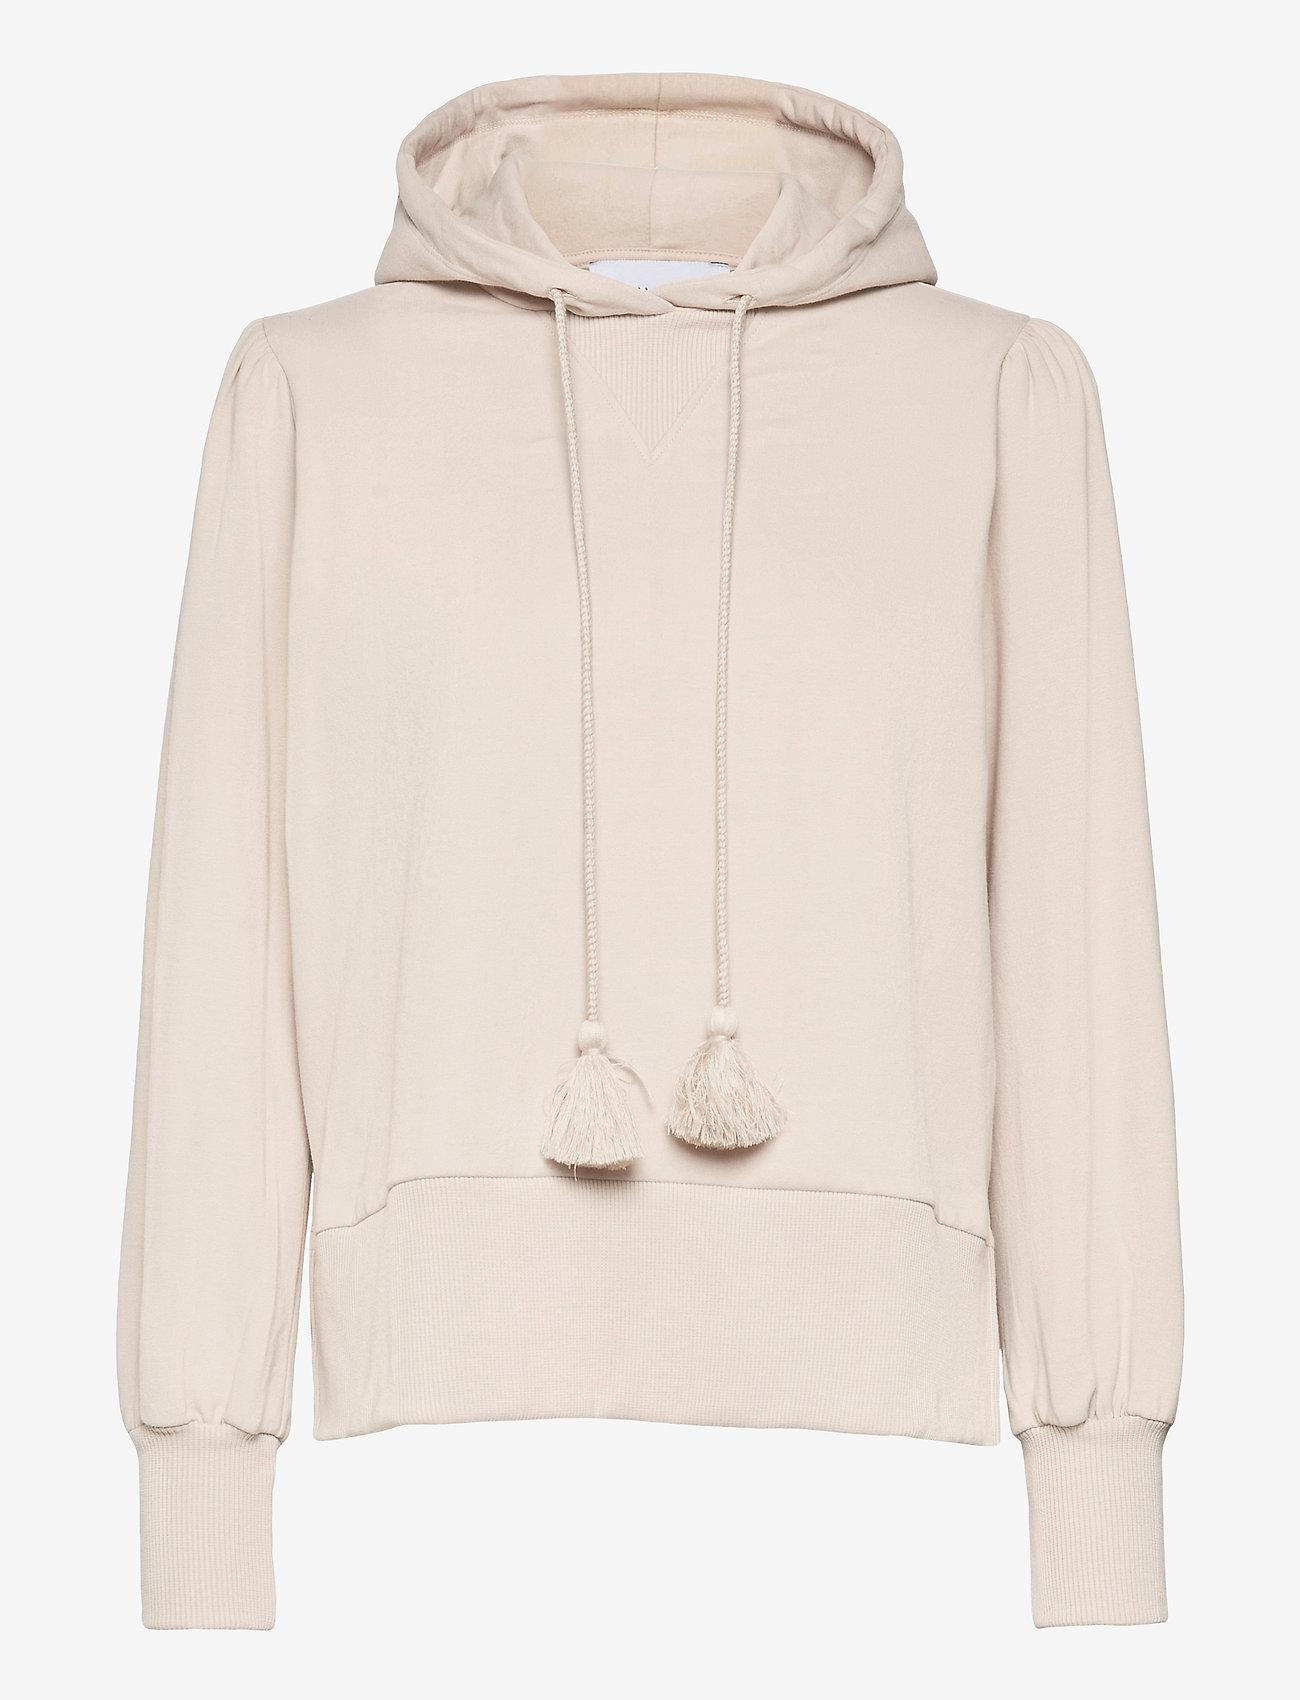 ella&il - Mimmi hoodie - pulls à capuche - beige - 0